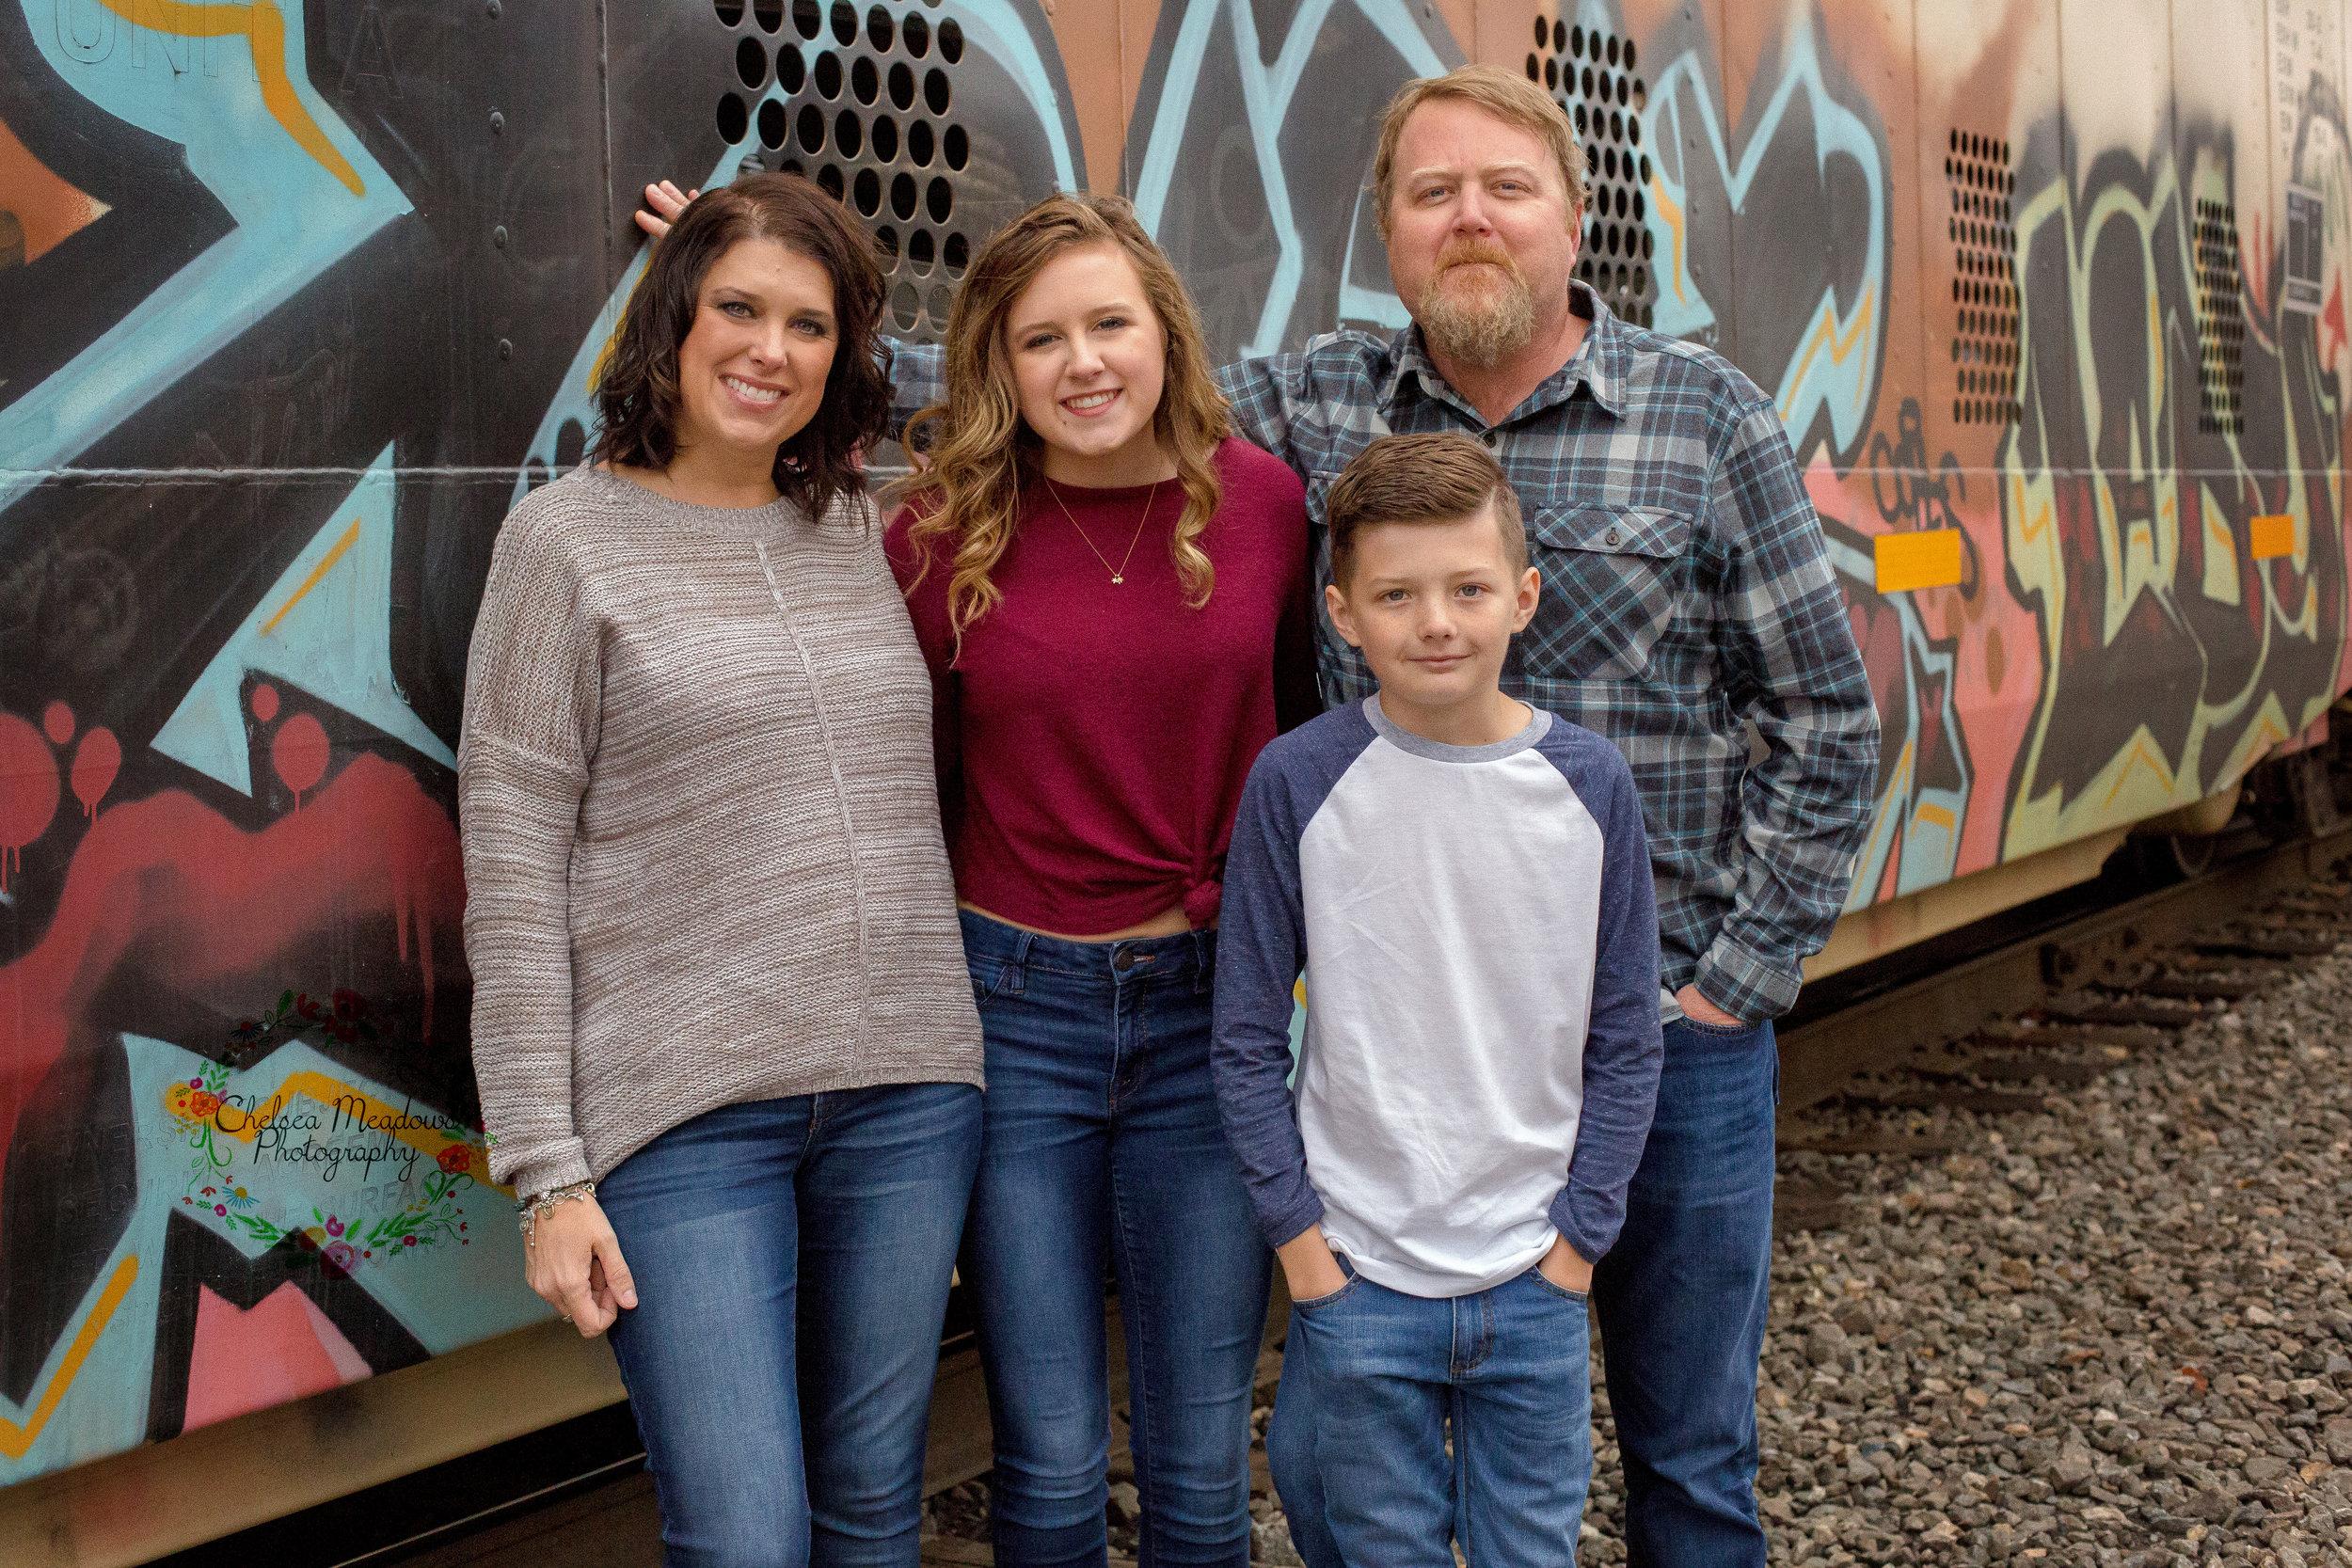 Shannon Family Session - Nashville Family Photographer - Chelsea Meadows Photography (59).jpg